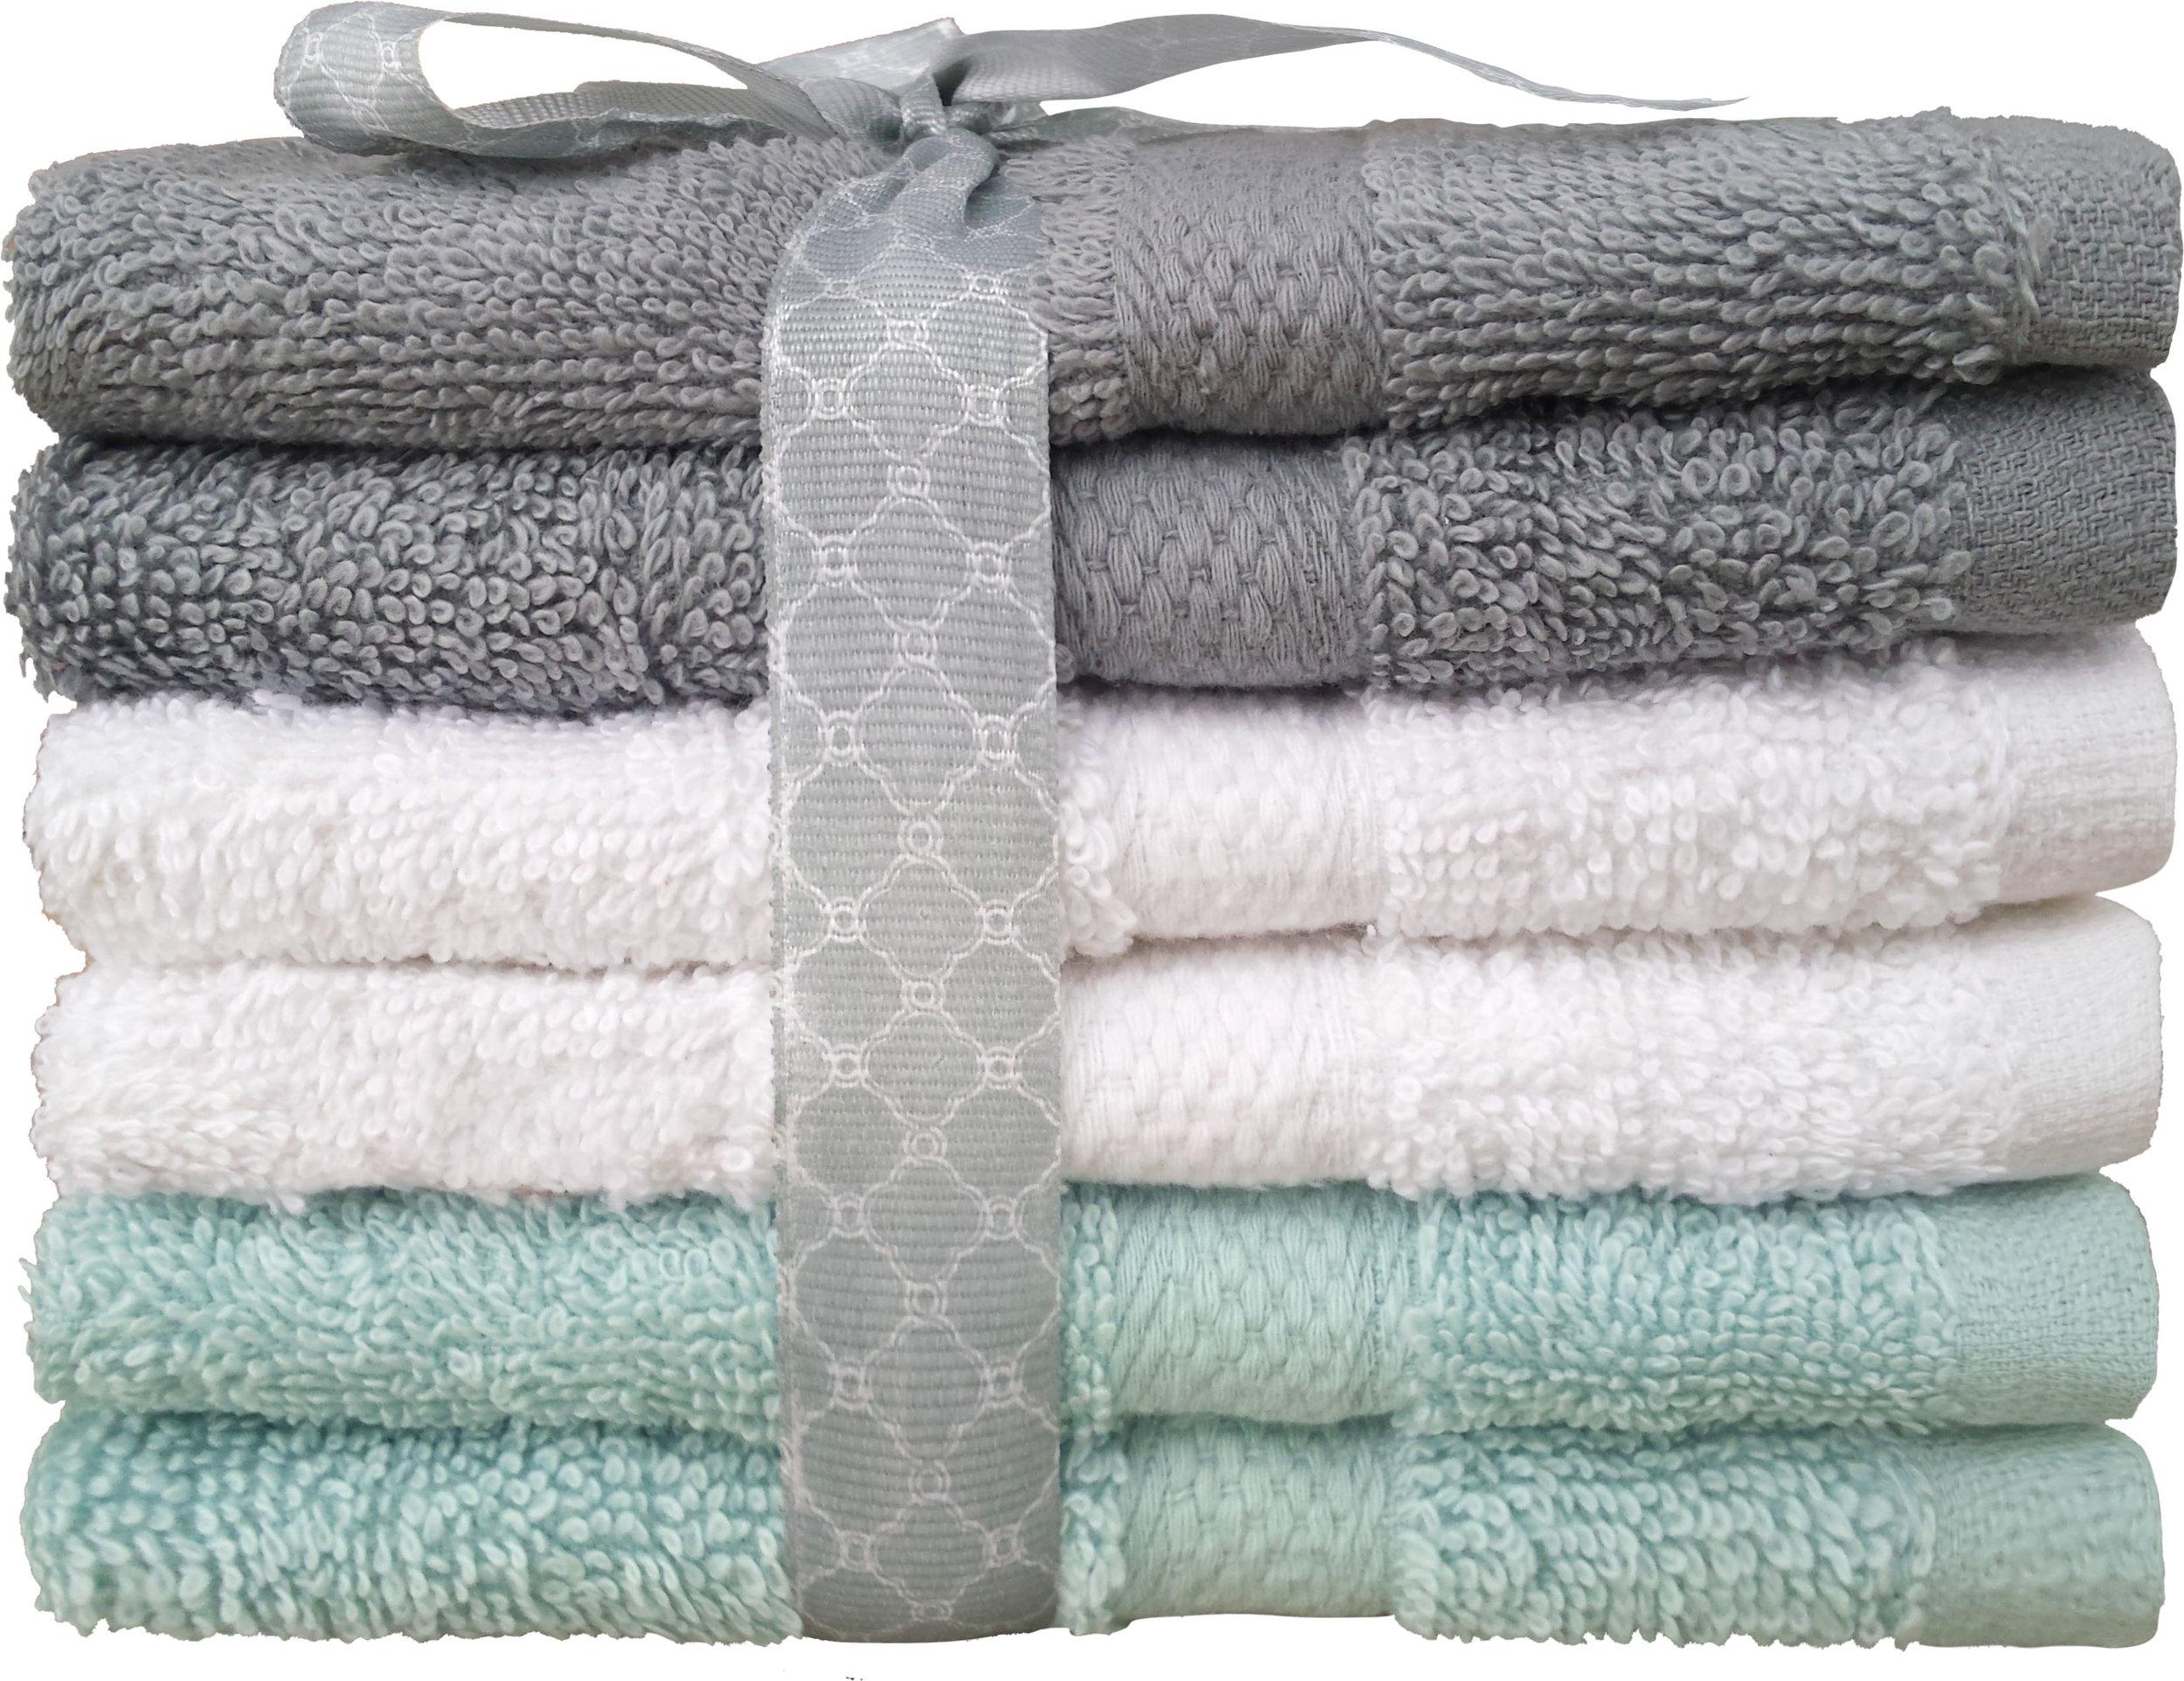 Washcloth Sets